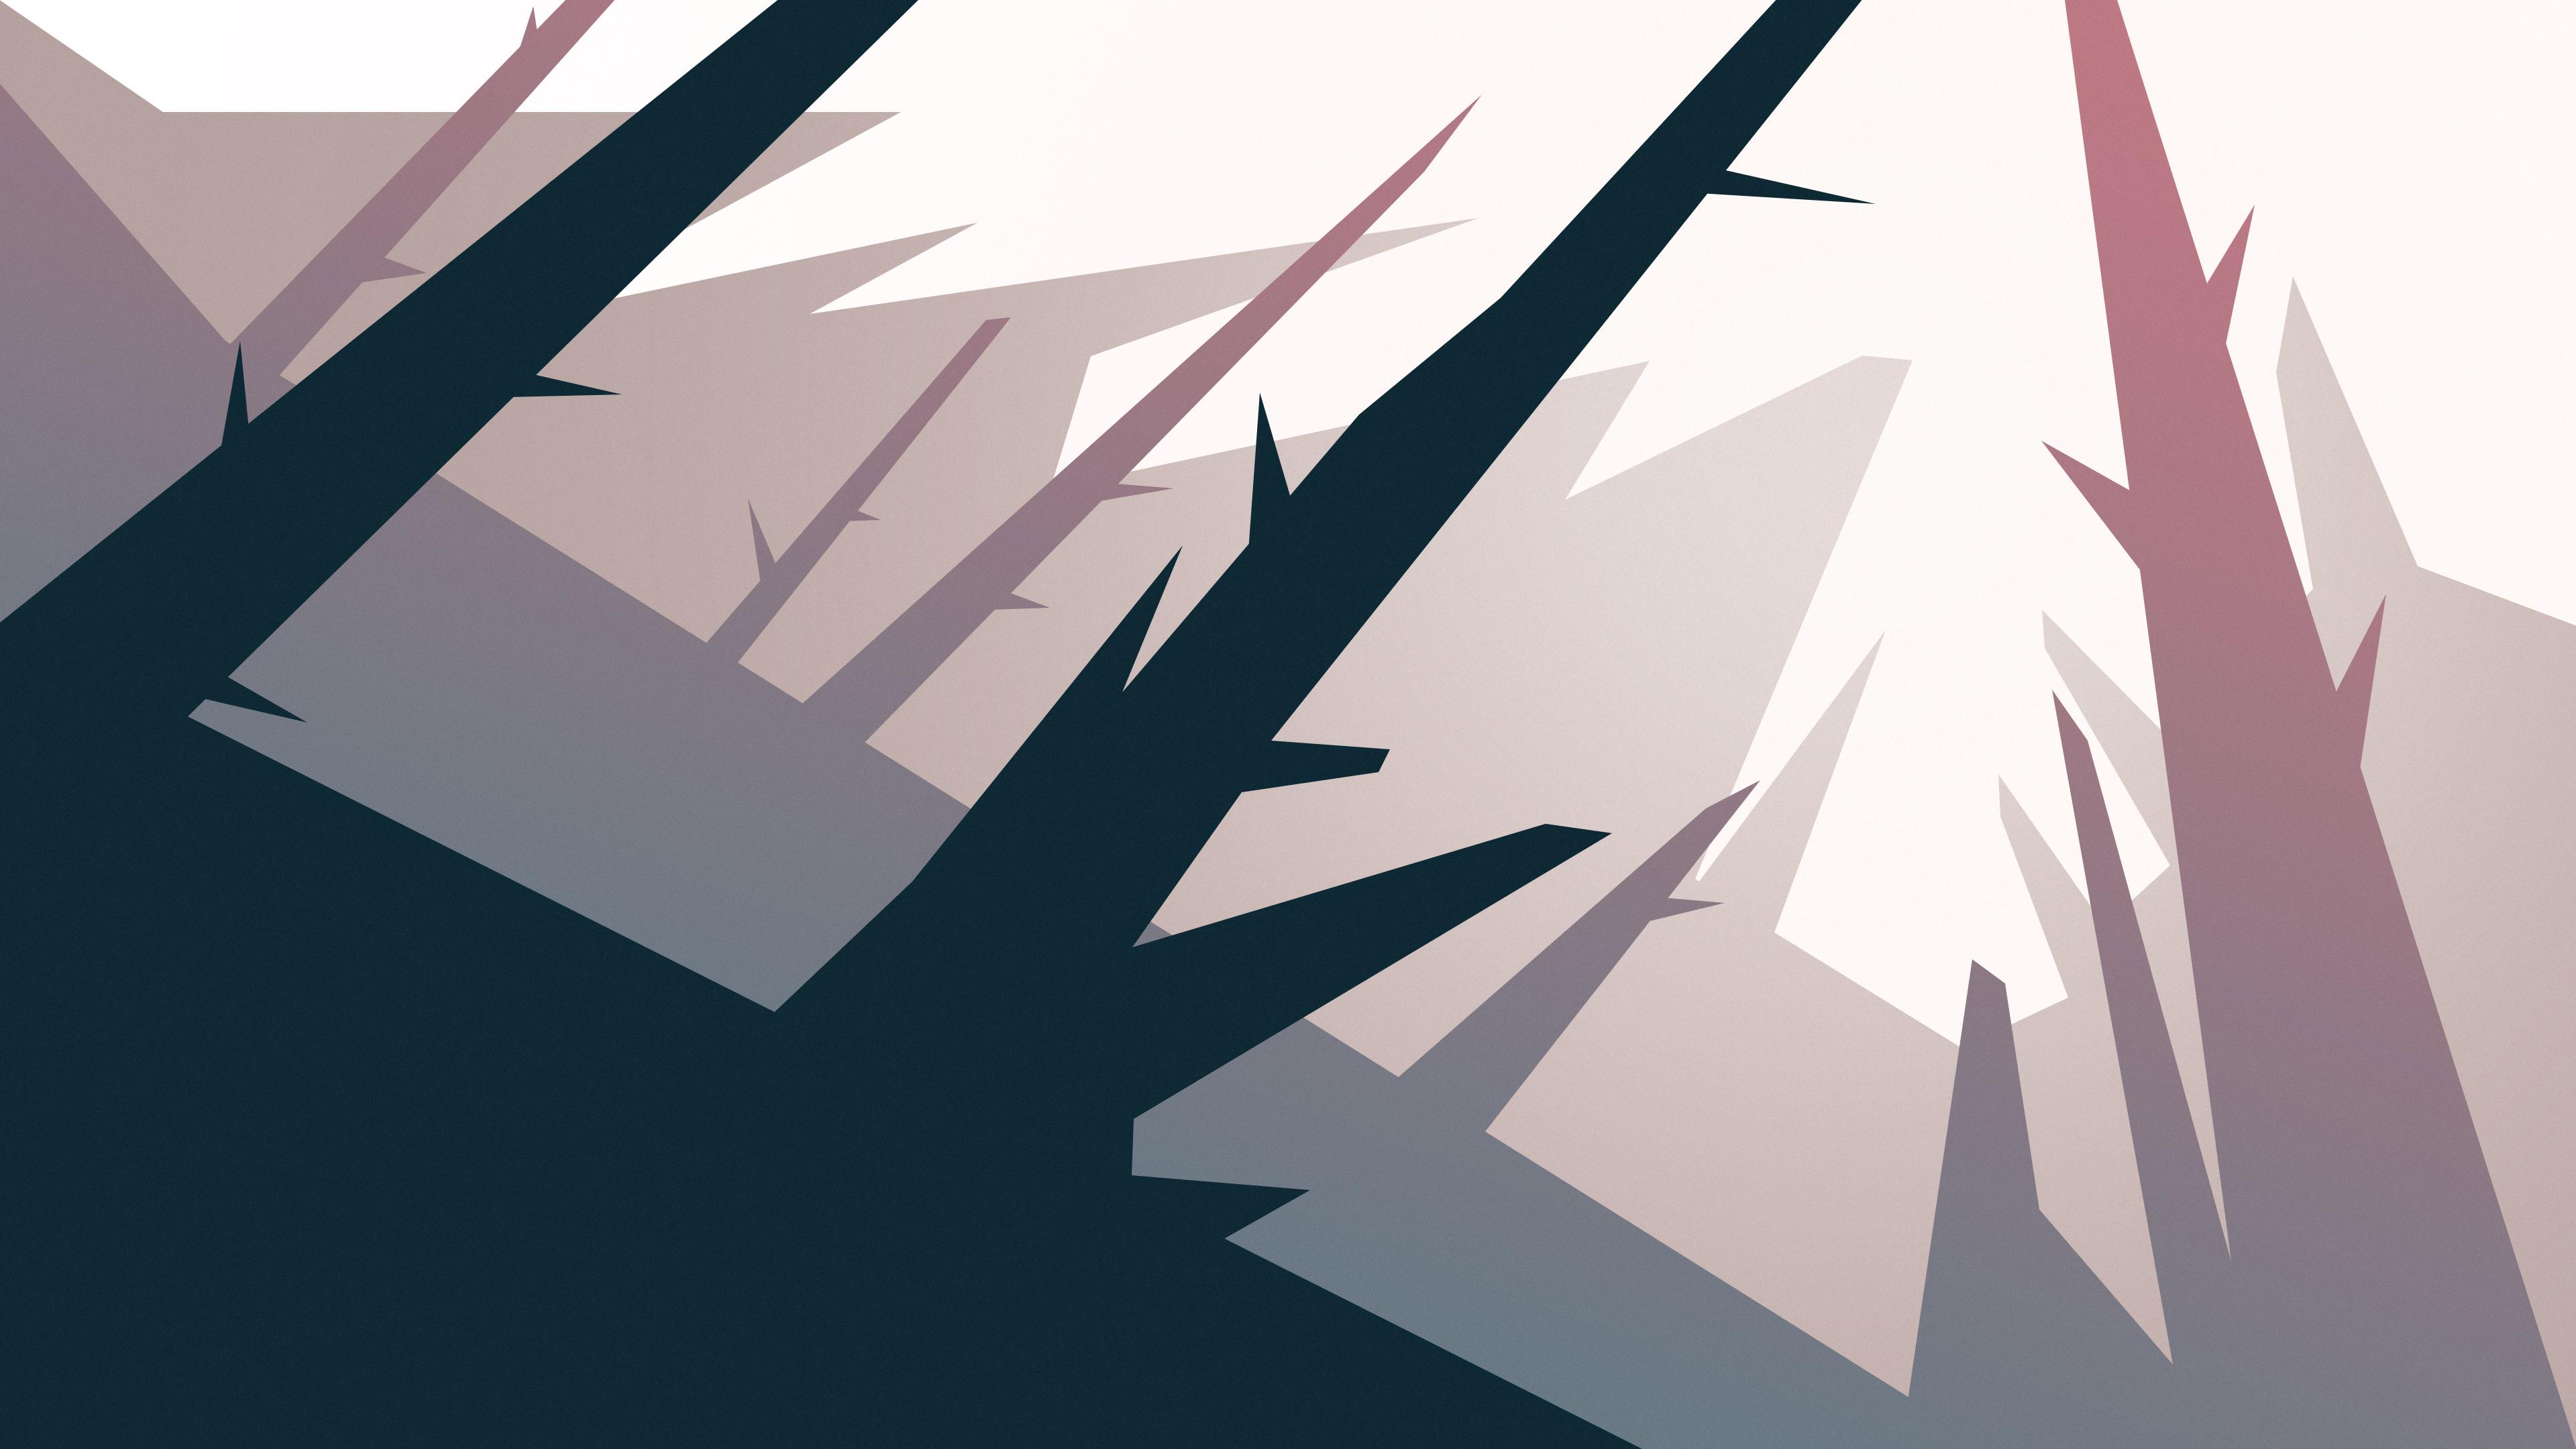 forest trees minimalism 4k 1540755600 - Forest Trees Minimalism 4k - tree wallpapers, minimalism wallpapers, hd-wallpapers, forest wallpapers, digital art wallpapers, deviantart wallpapers, artwork wallpapers, artist wallpapers, 4k-wallpapers